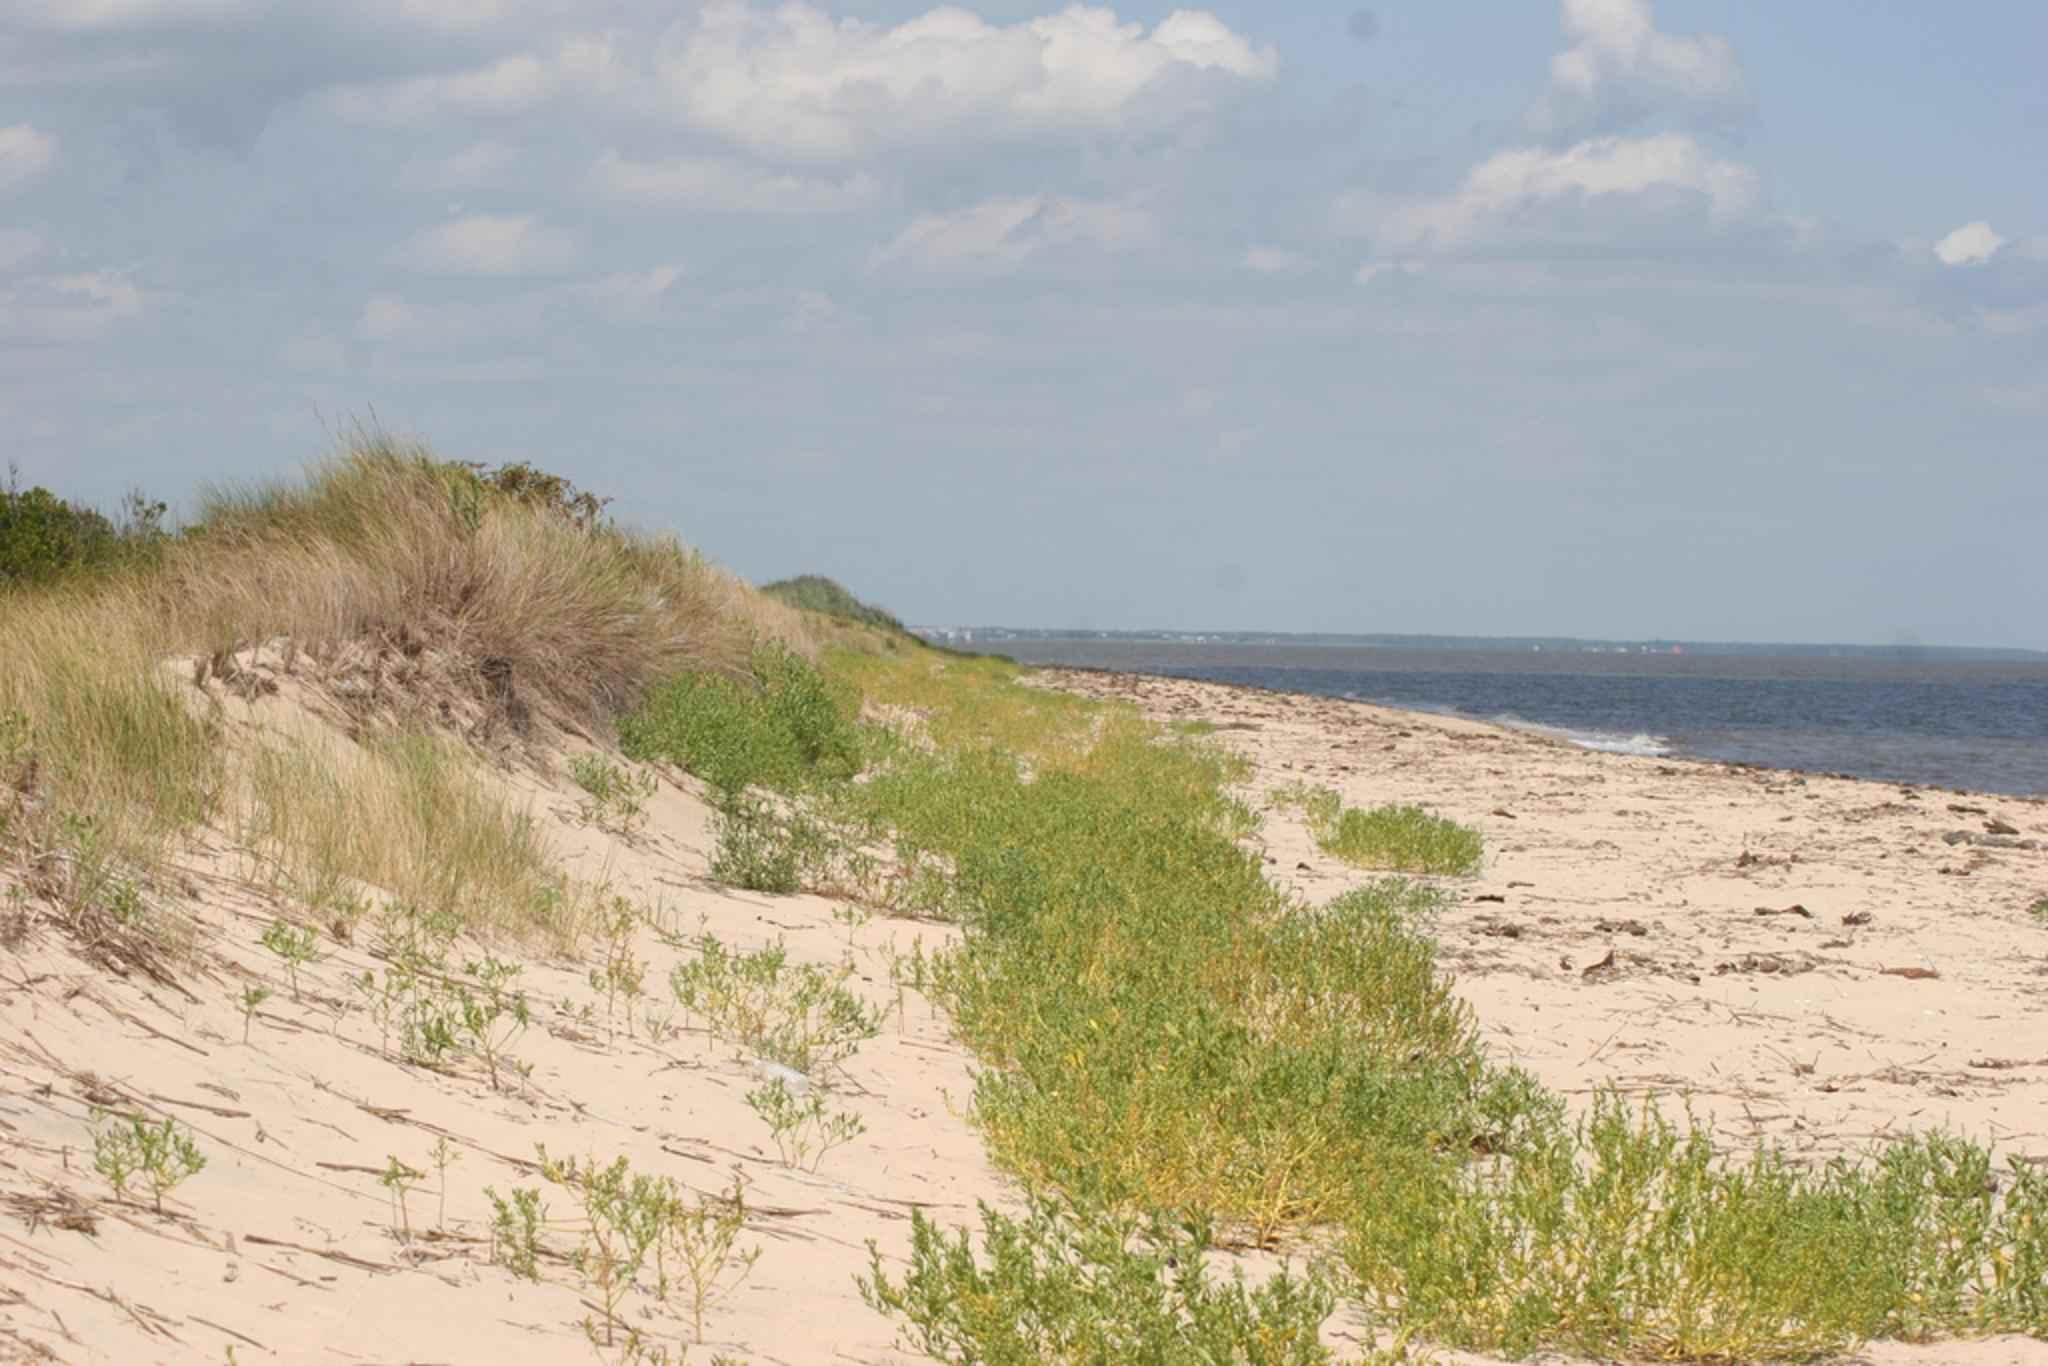 Sand Dunes File:Sand dunes along ...